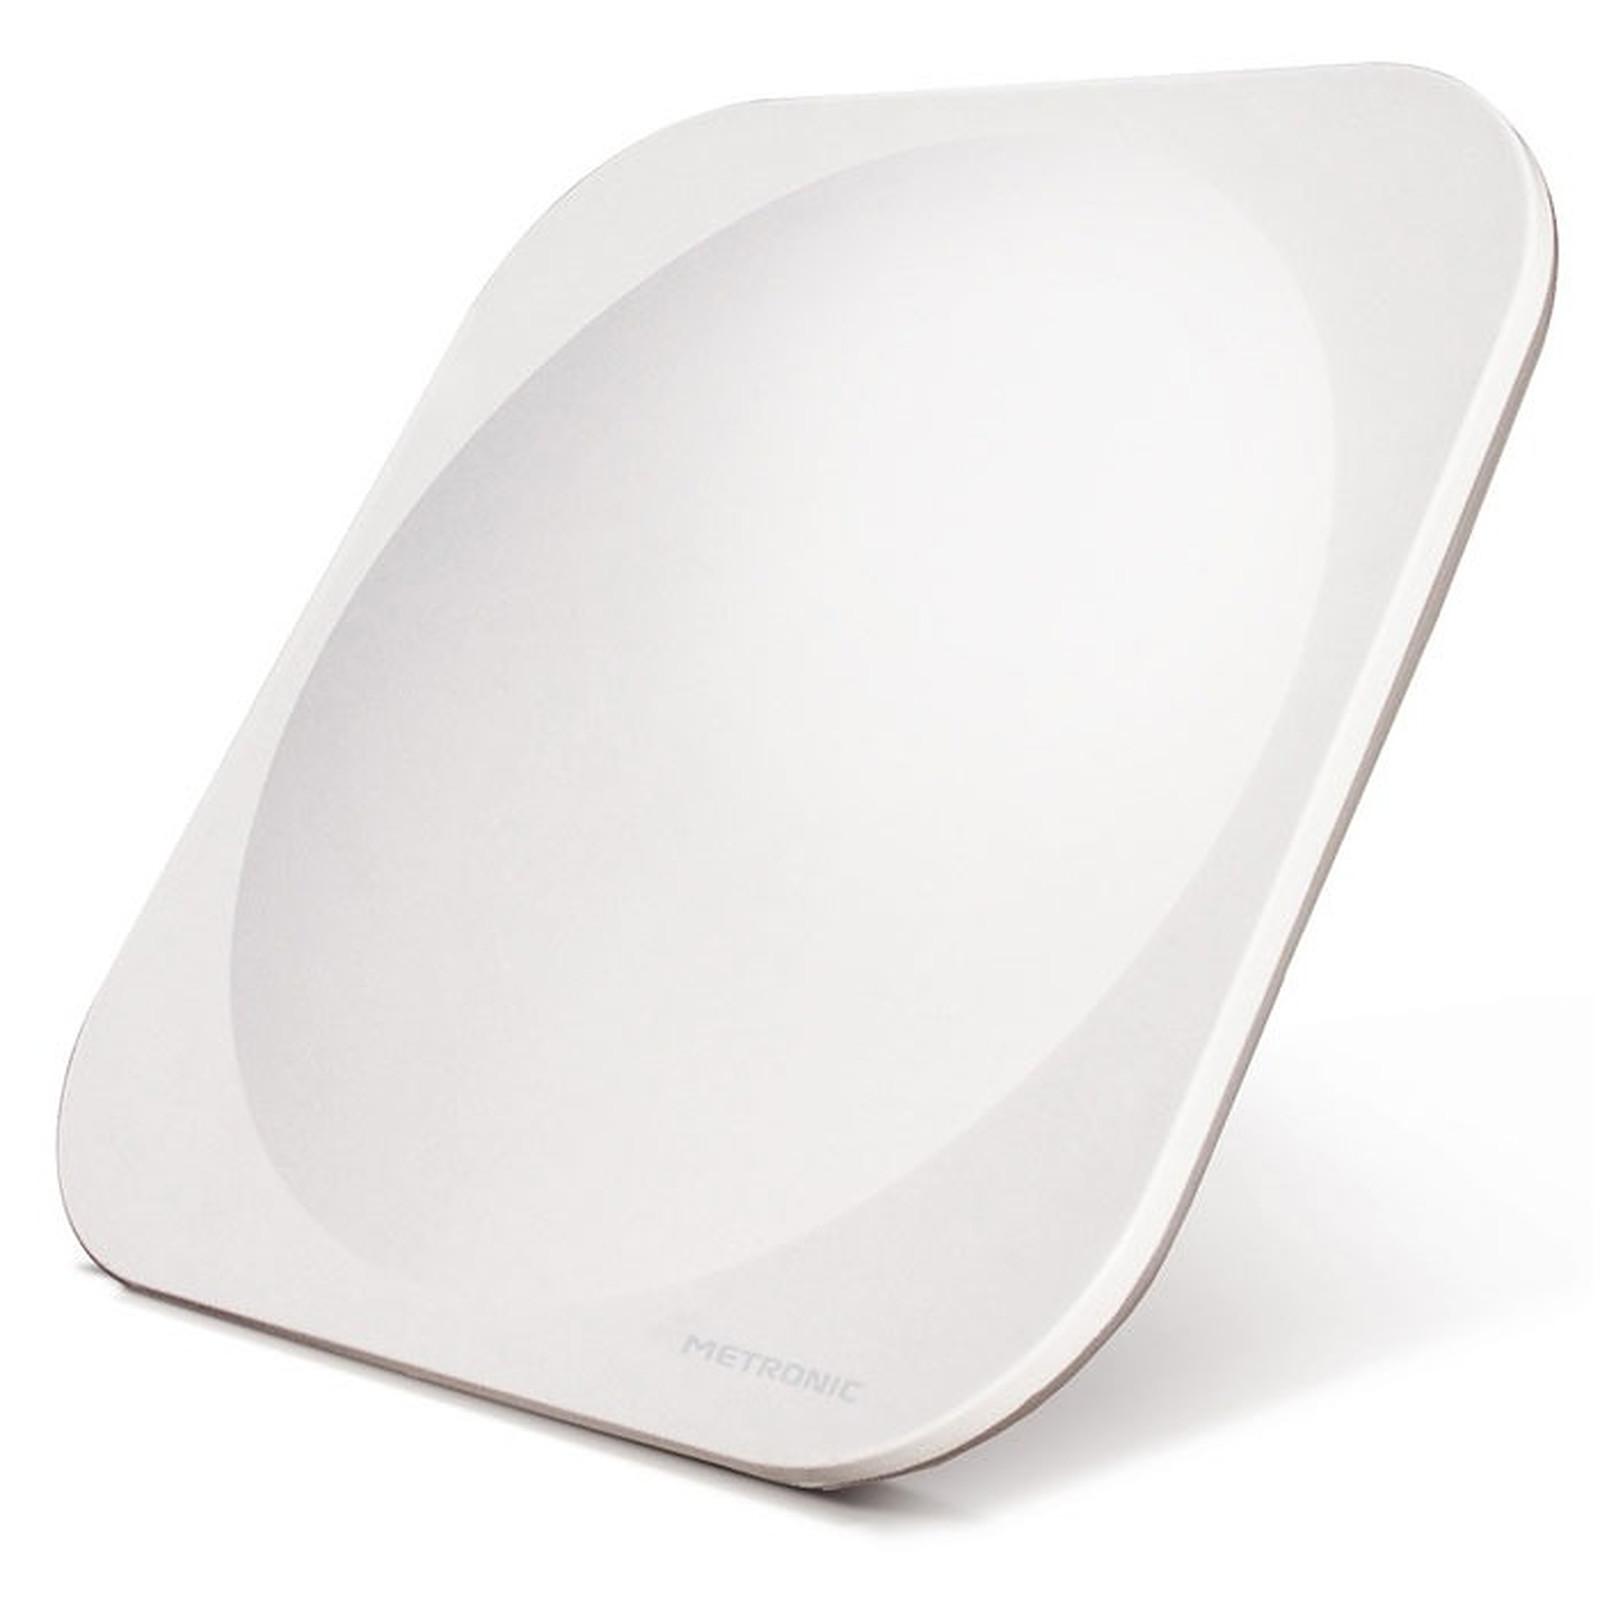 antenne satellite plate metronic